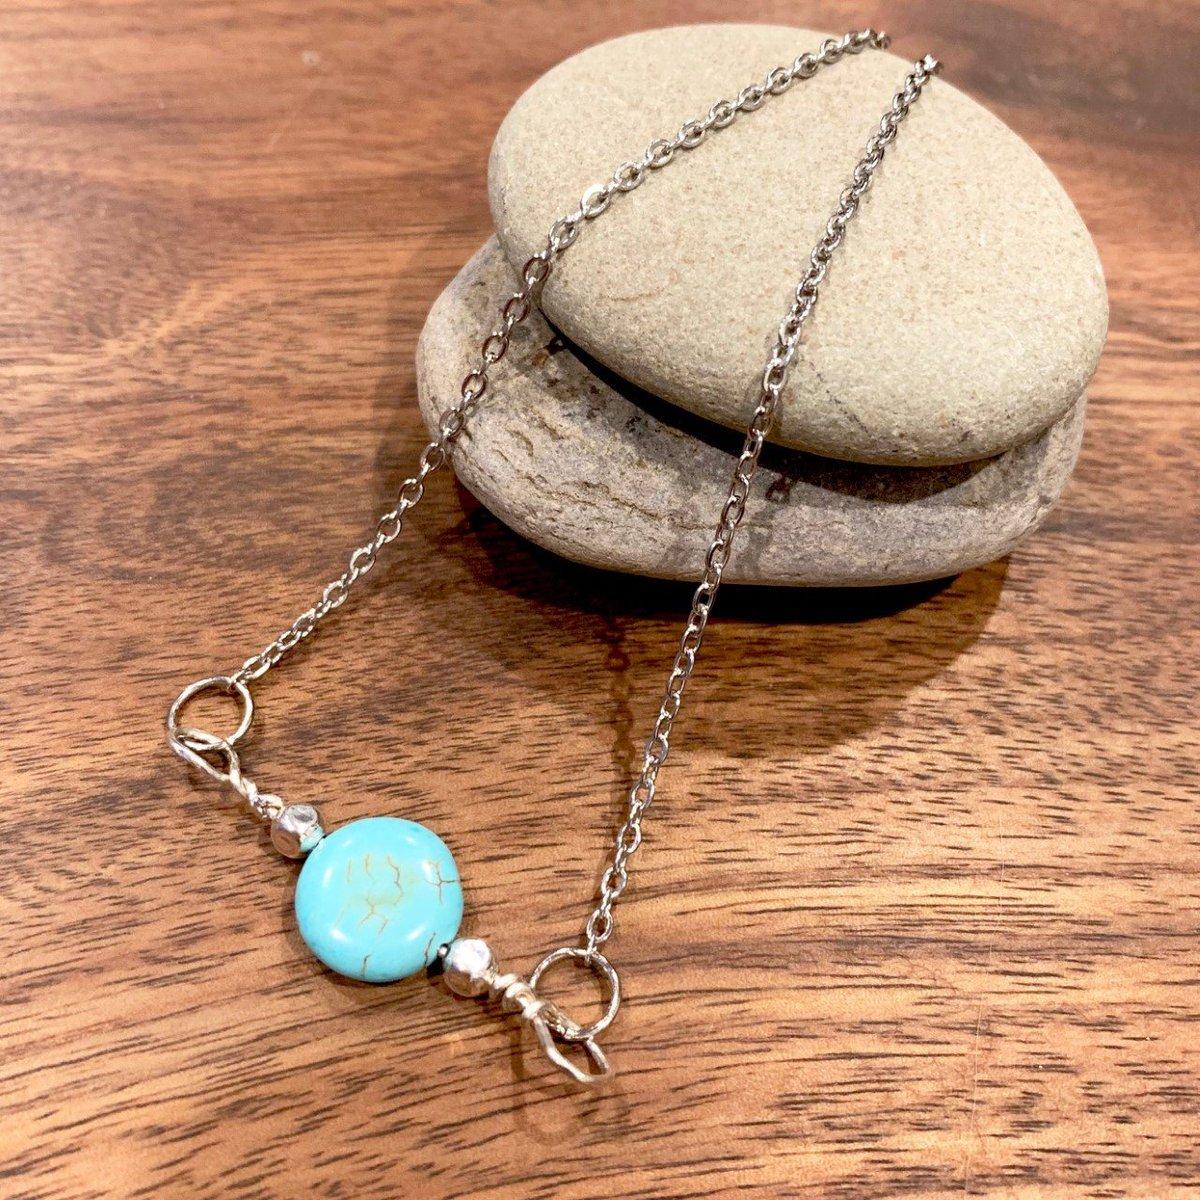 Turquoise color Howlite Single Stone Pendant http://tuppu.net/ef11585 #artisanjewelry #MandanaStudios #giftsforalloccasions #handmadejewelry #Jewellerypic.twitter.com/3FRxmRmYI0